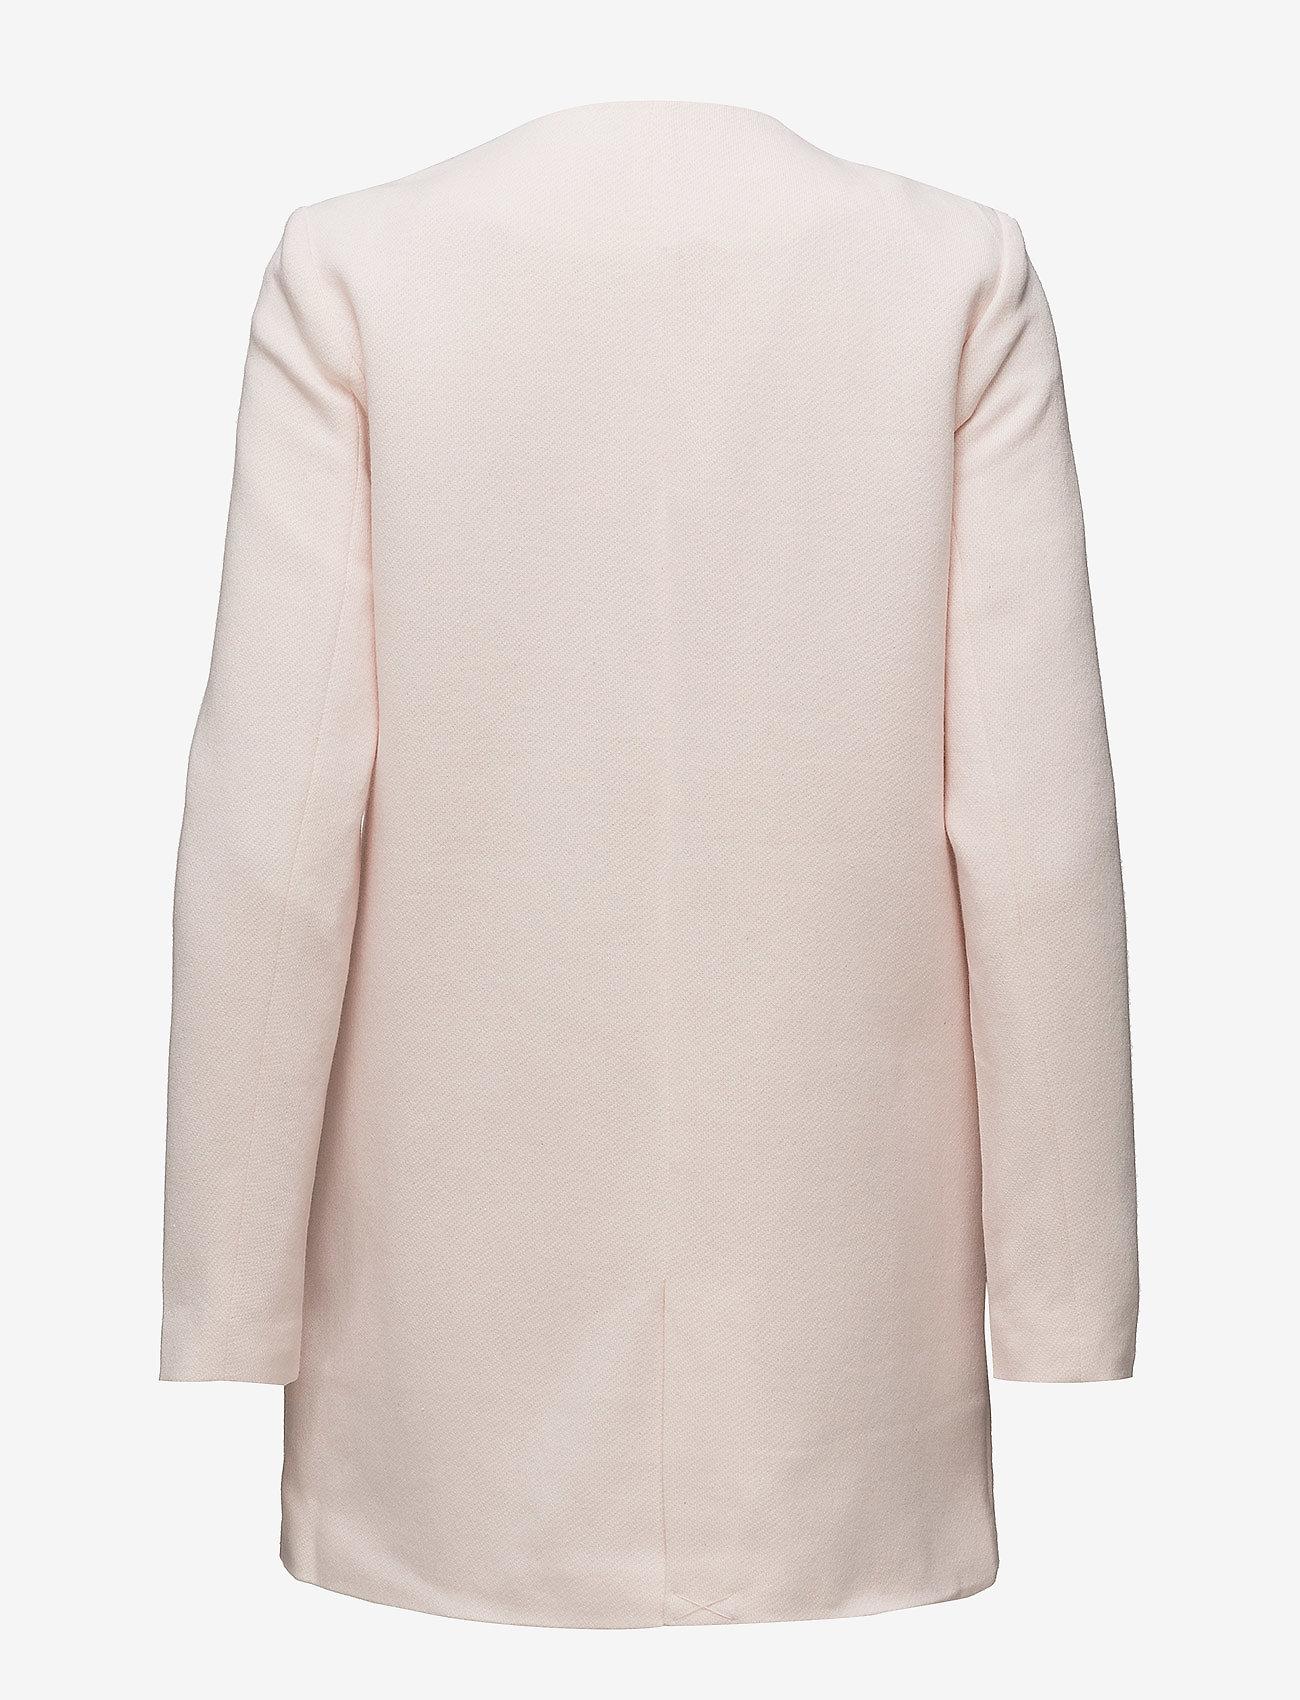 ONLY - onlSIDNEY LIGHT COAT OTW NOOS - cienkie płaszcze - rose quartz - 1